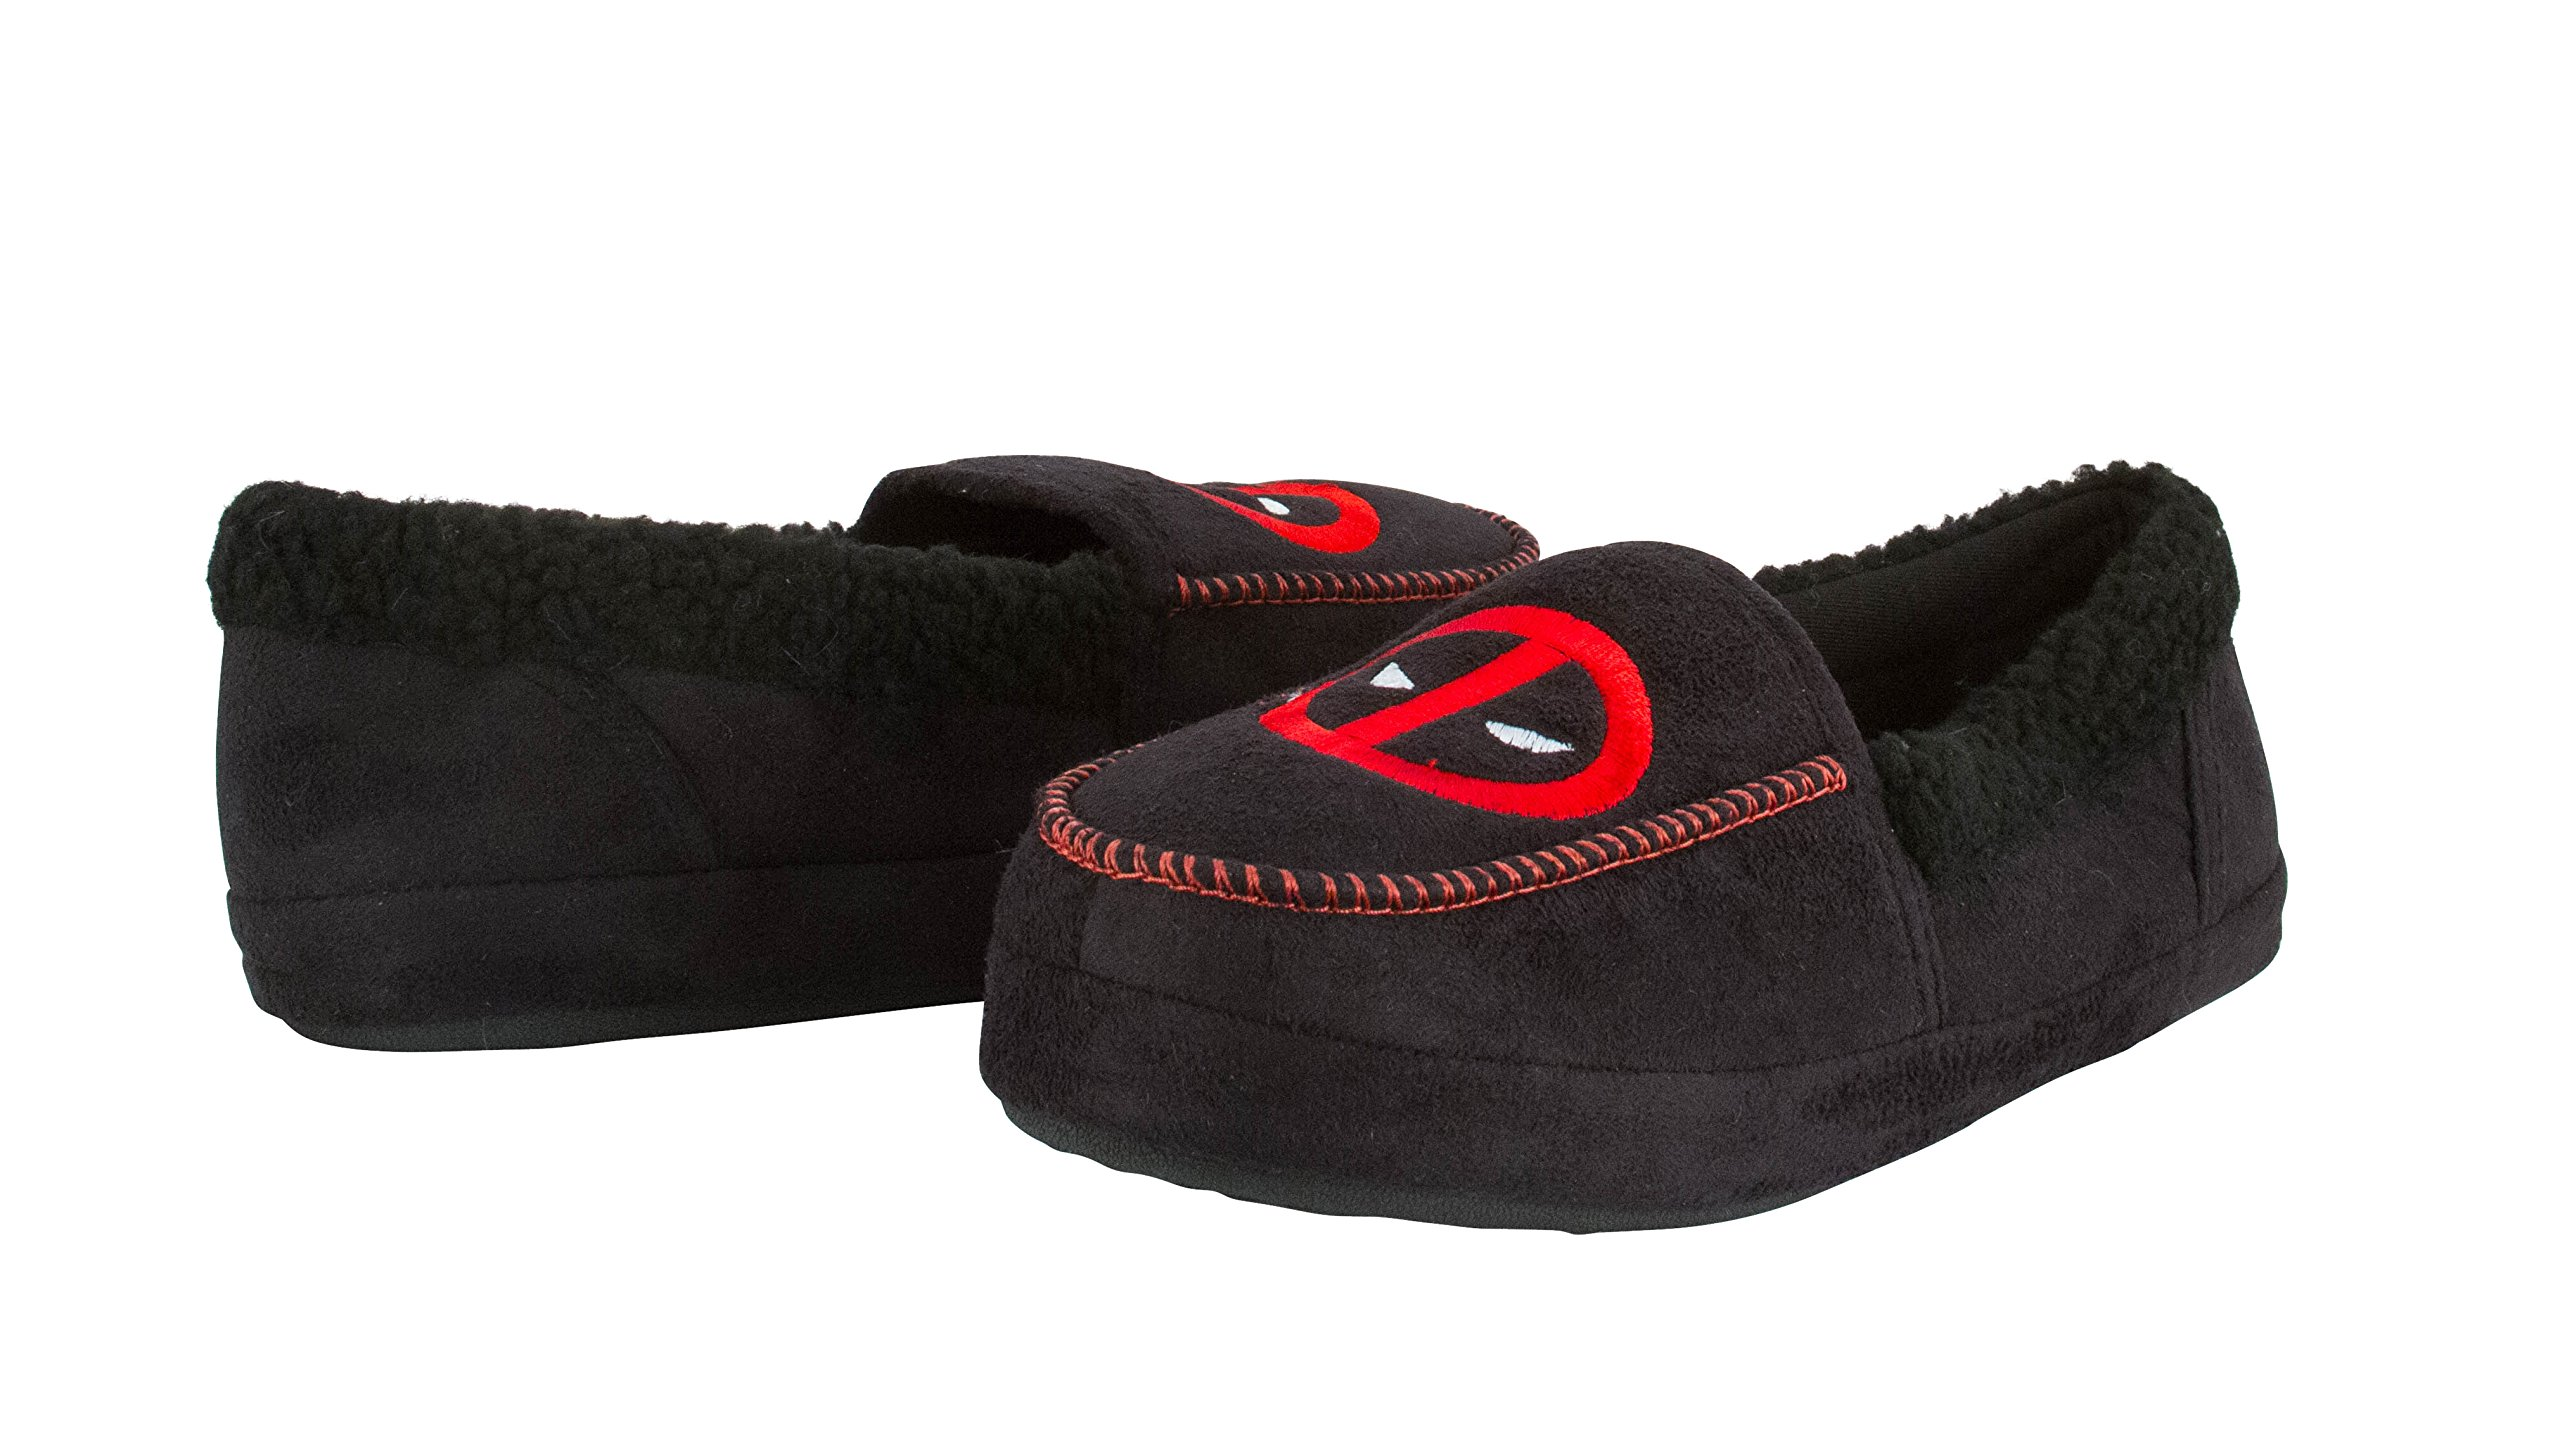 Marvel Deadpool Unisex Fleece Lined Moccasin Slippers With Deadpool Symbol L